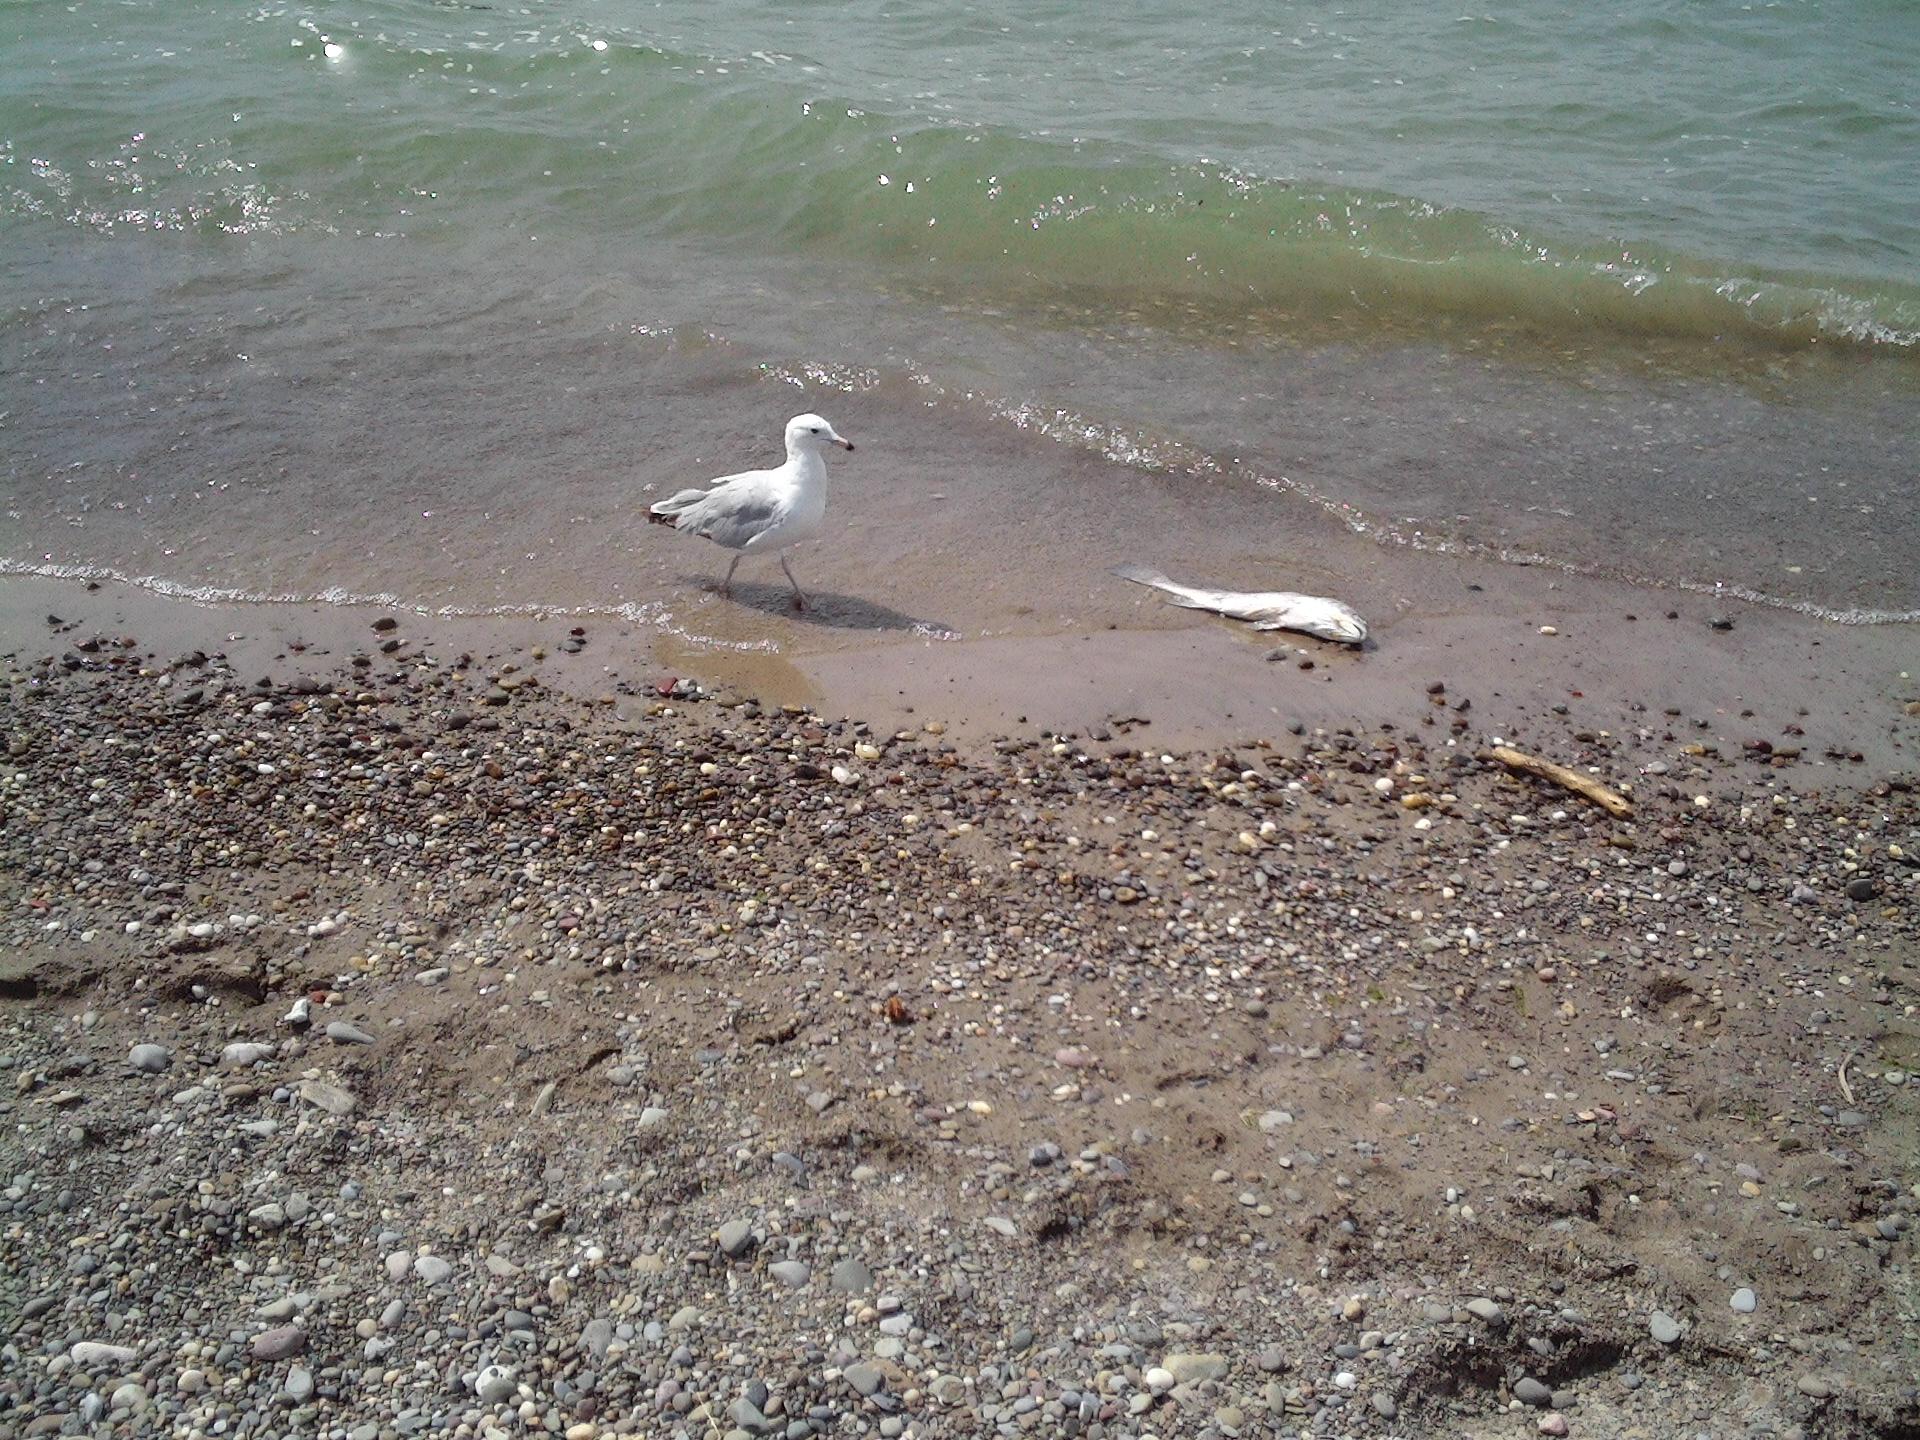 Slick Seagull, Bird, Dead, Fish, Ocean, HQ Photo